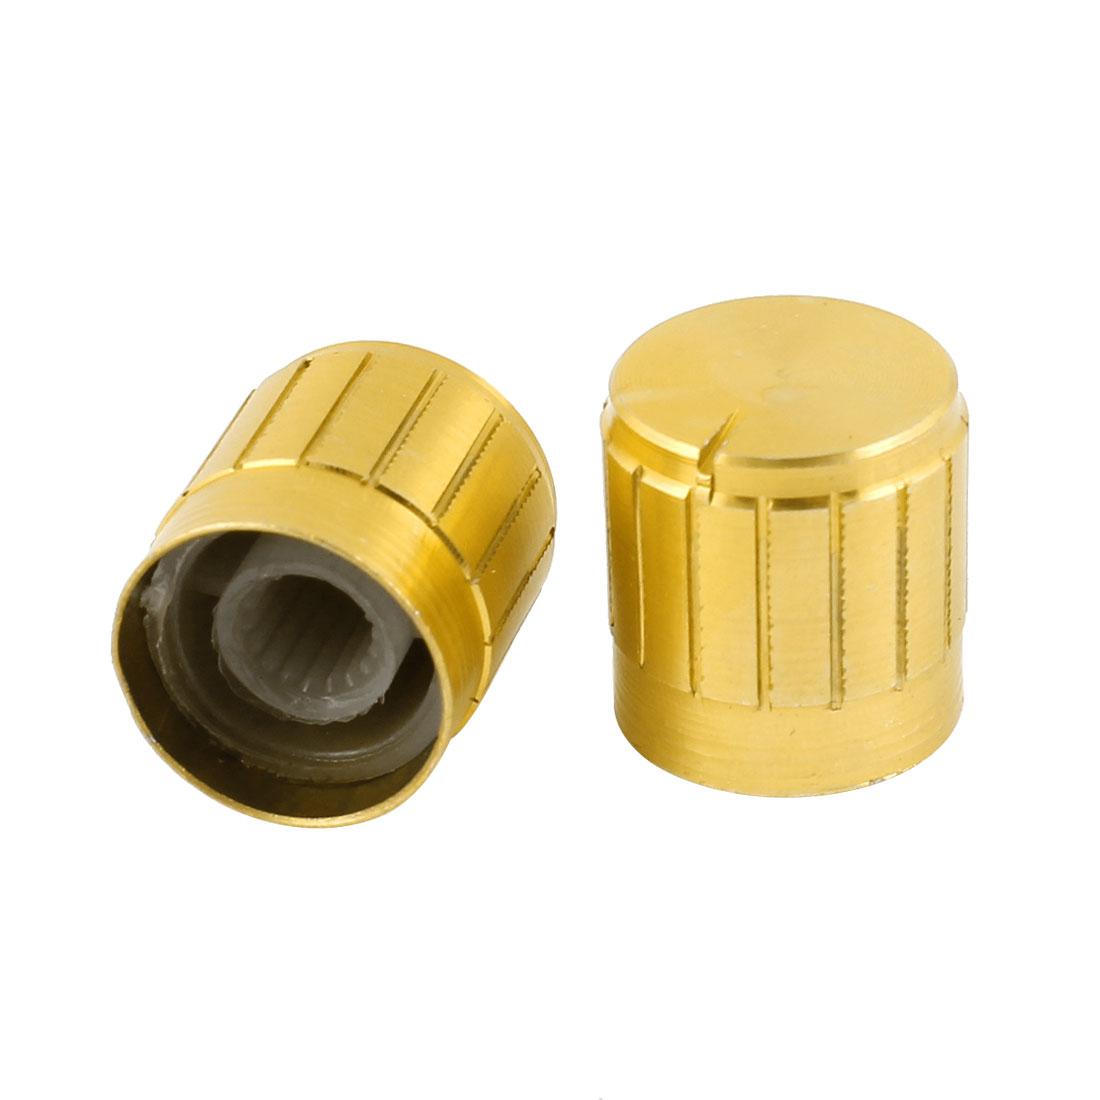 2 Pcs Gold Tone Volume Control Aluminum Potentiometer Knobs Caps 17mm x 17mm